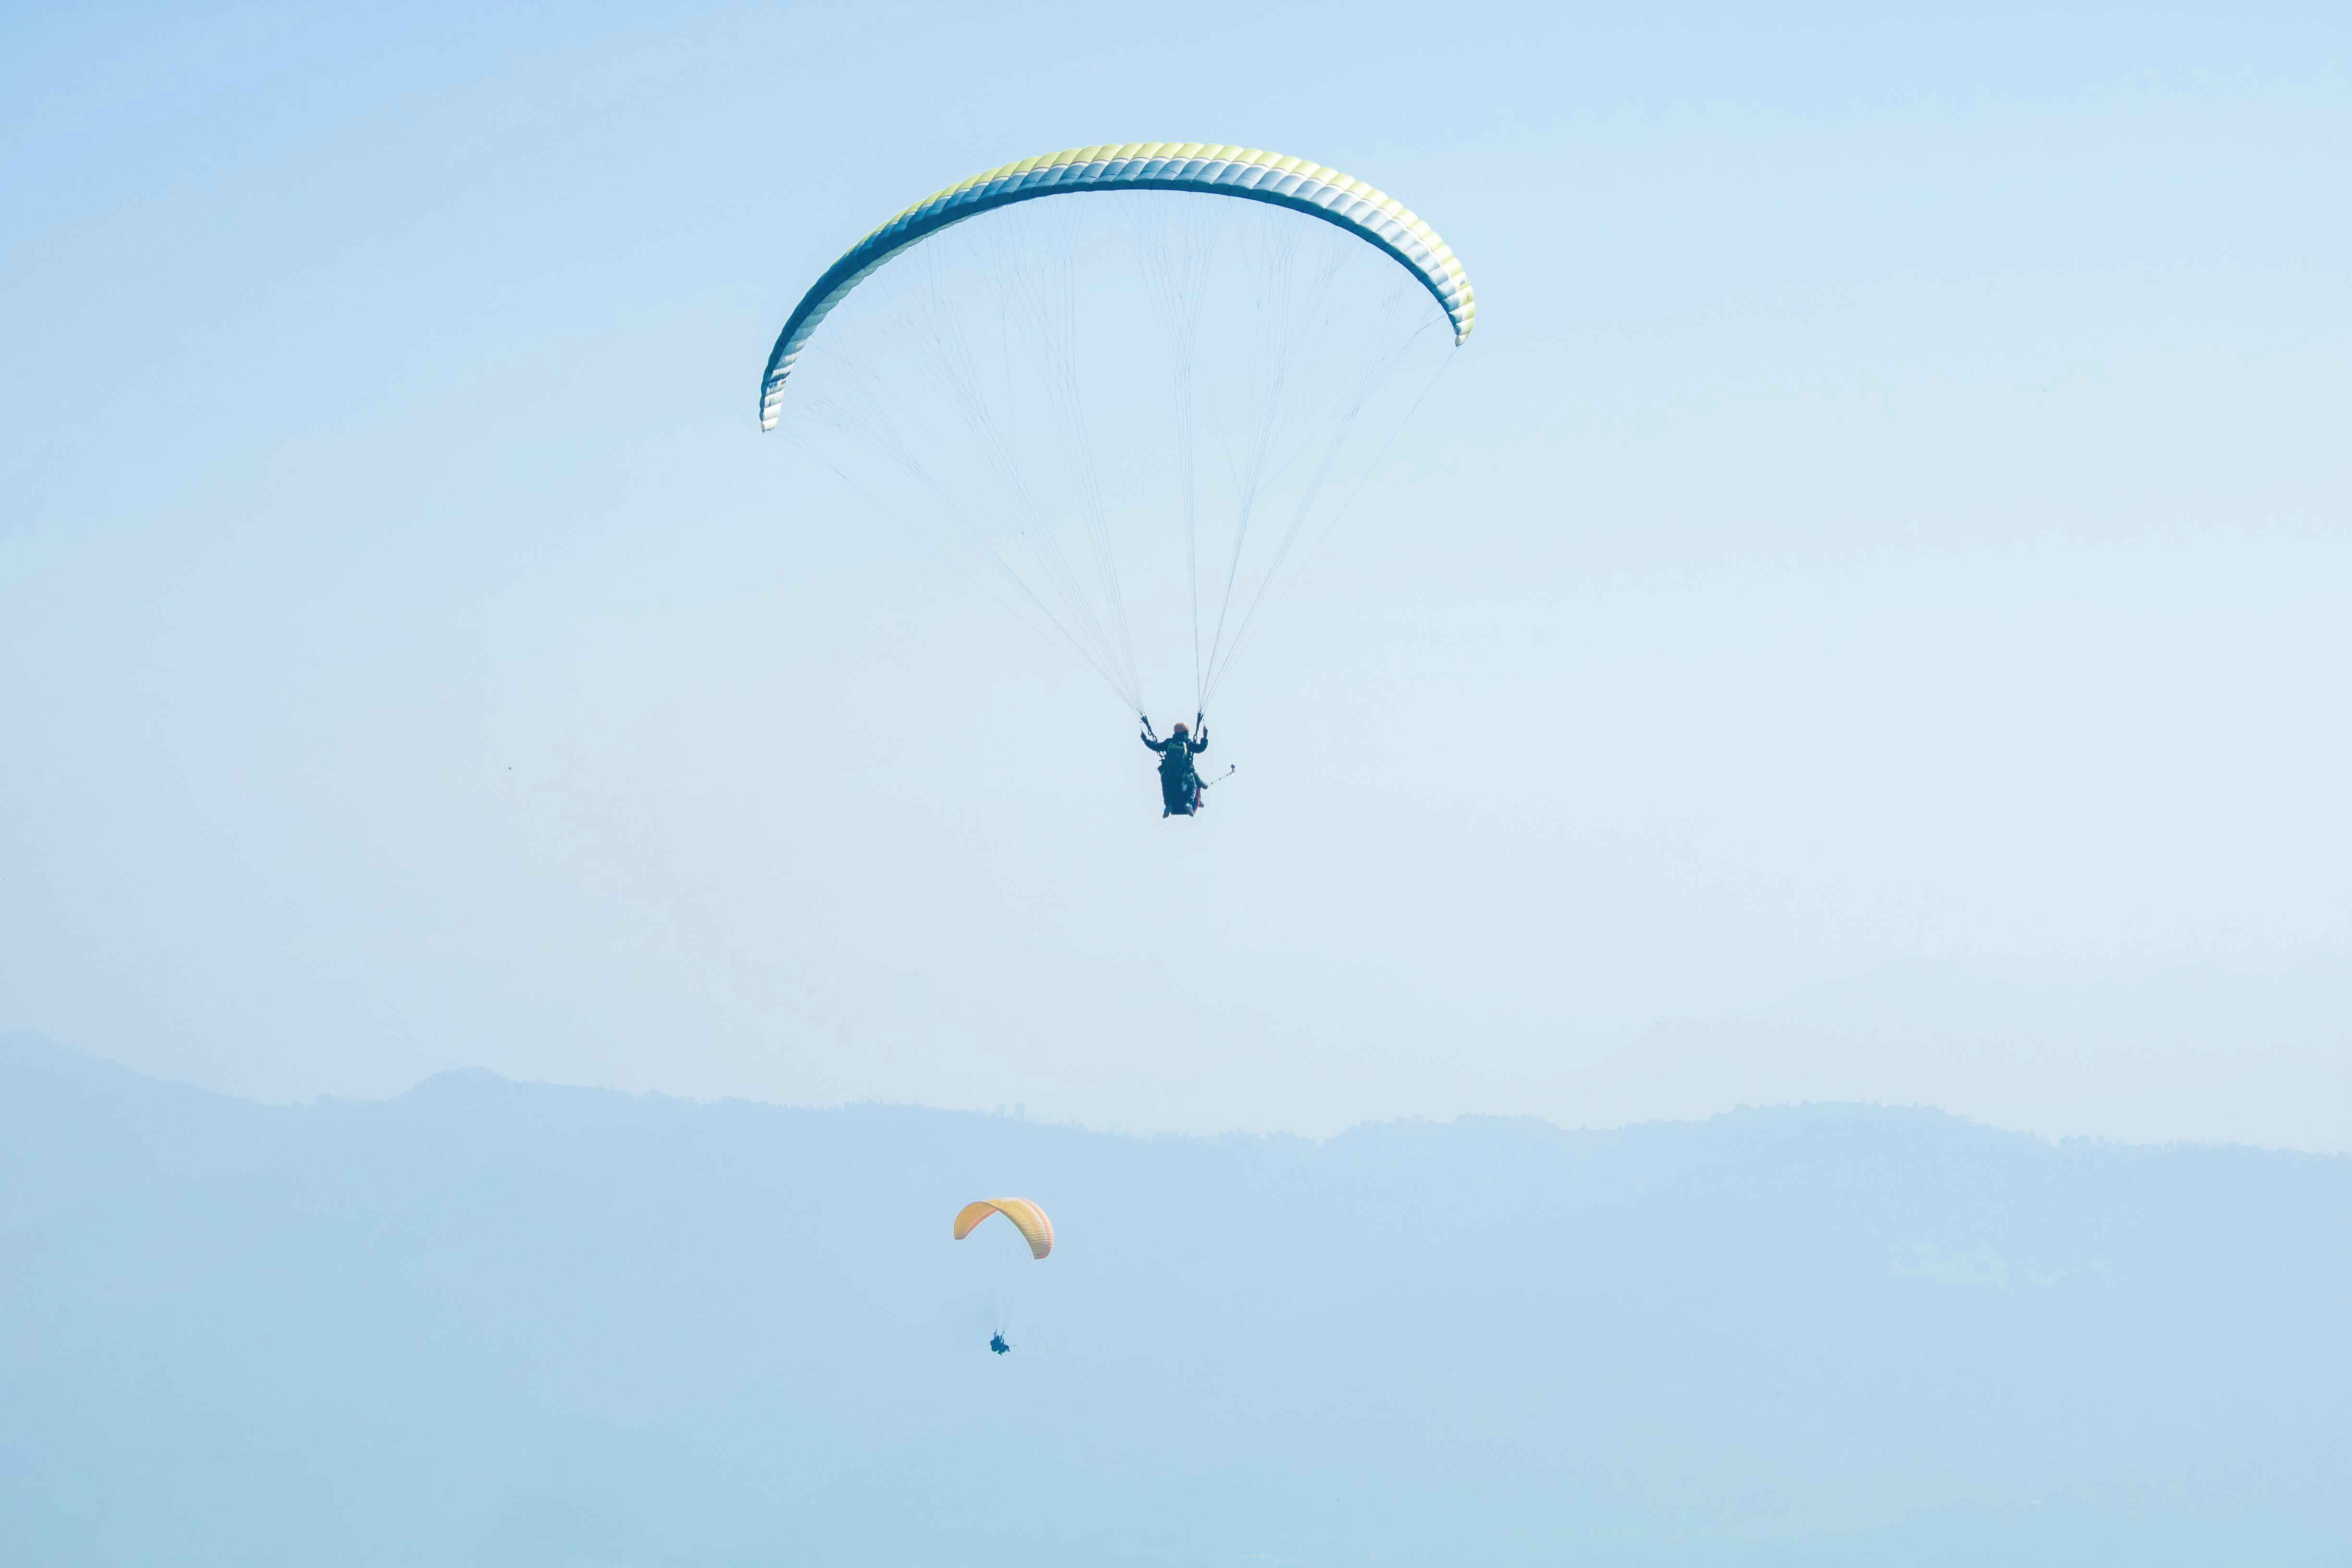 man parachuting under blue sky